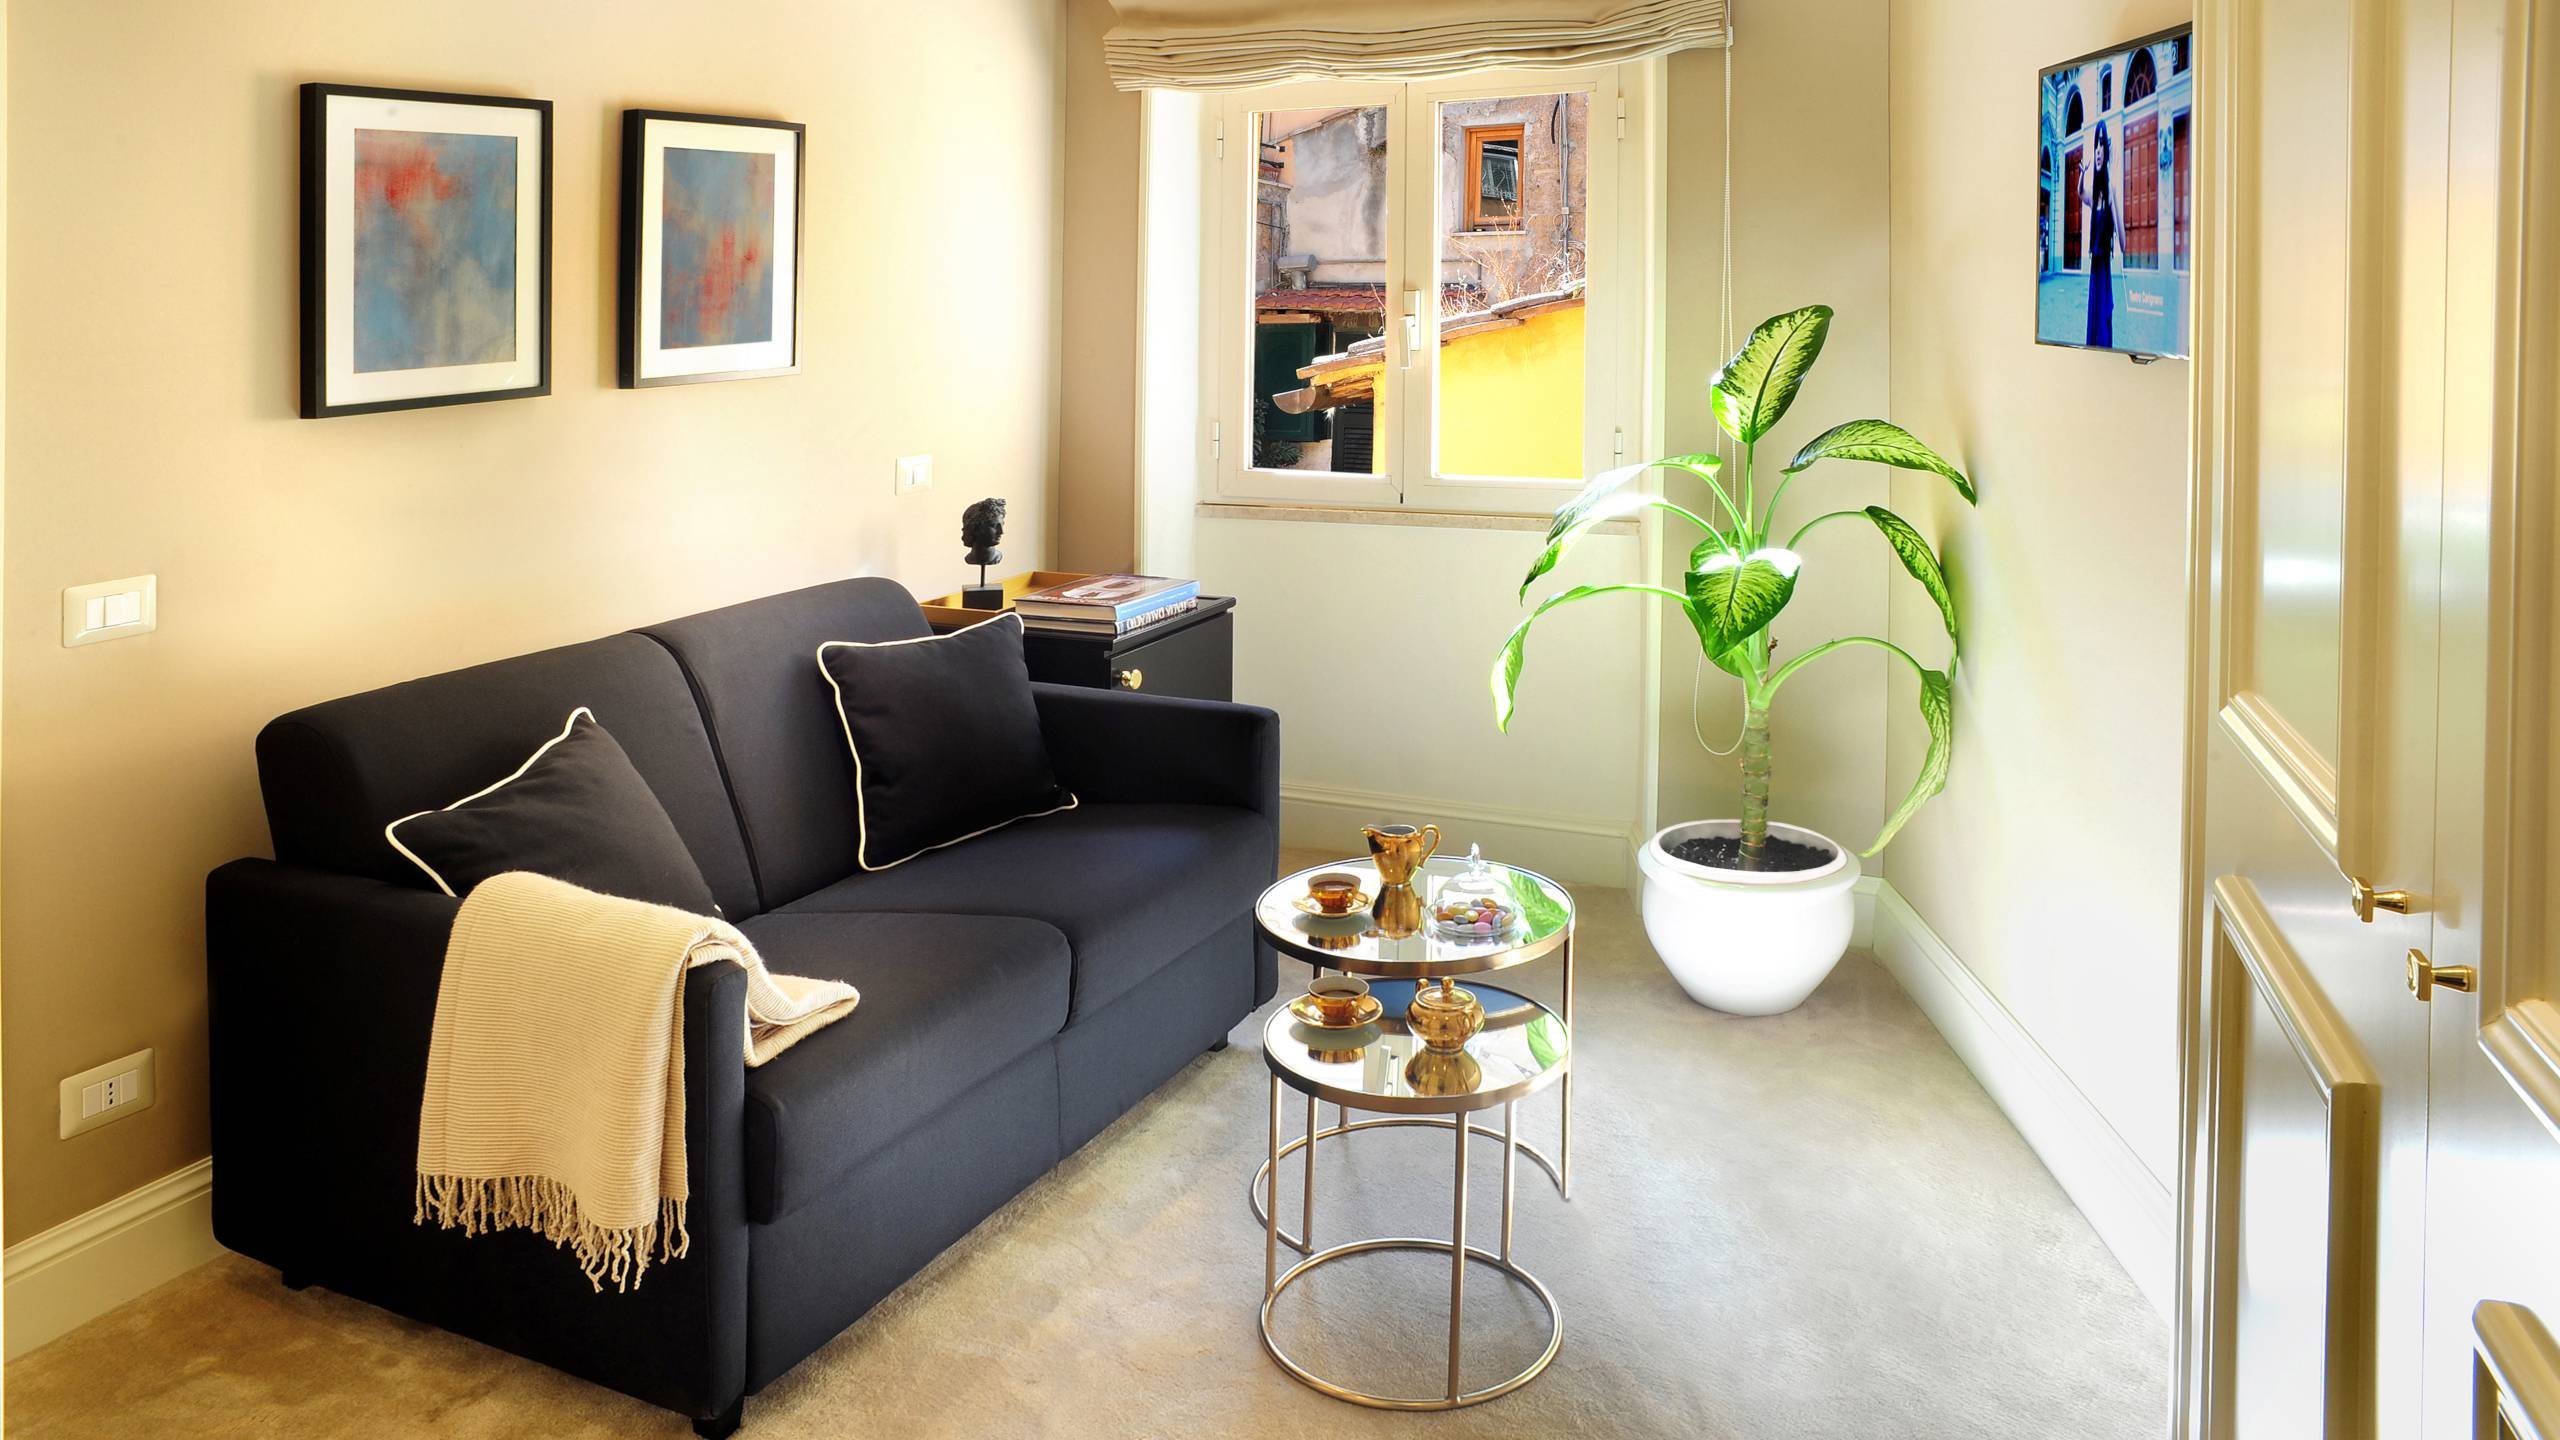 Nerva-Boutique-Hotel-living-room-40